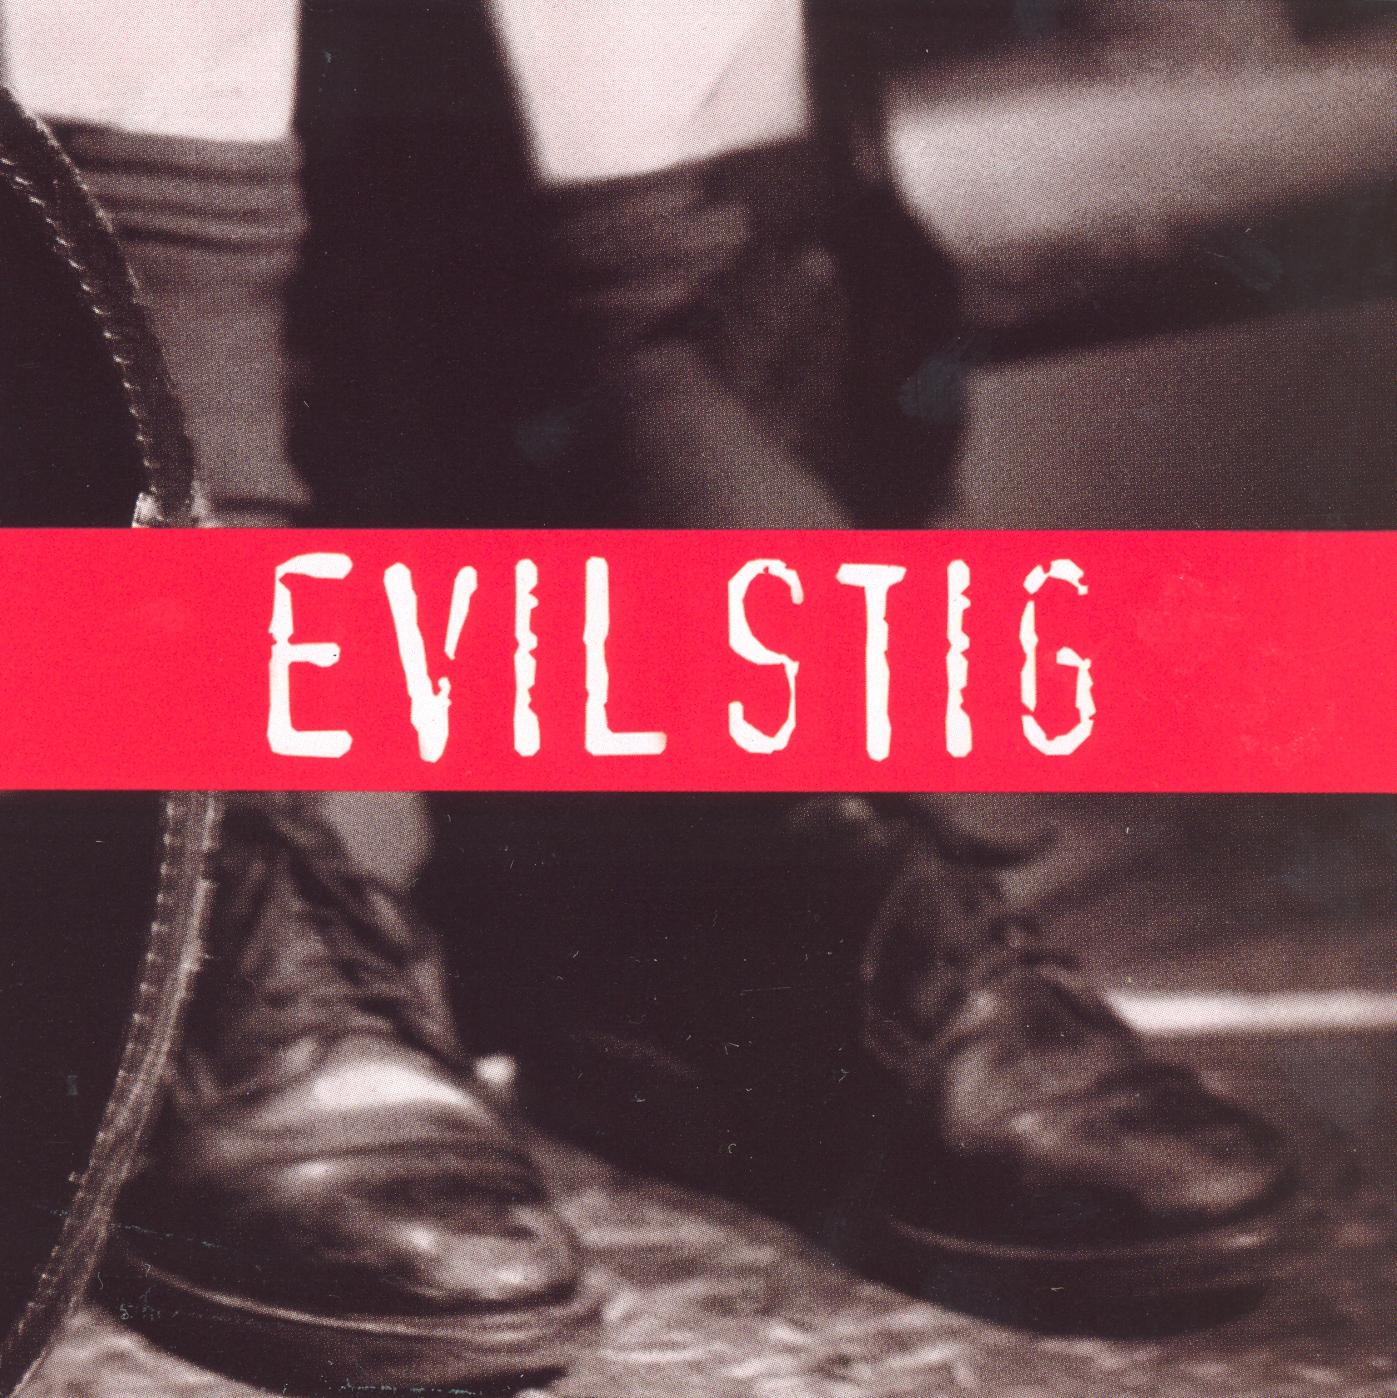 EvilStigCDcover.jpg